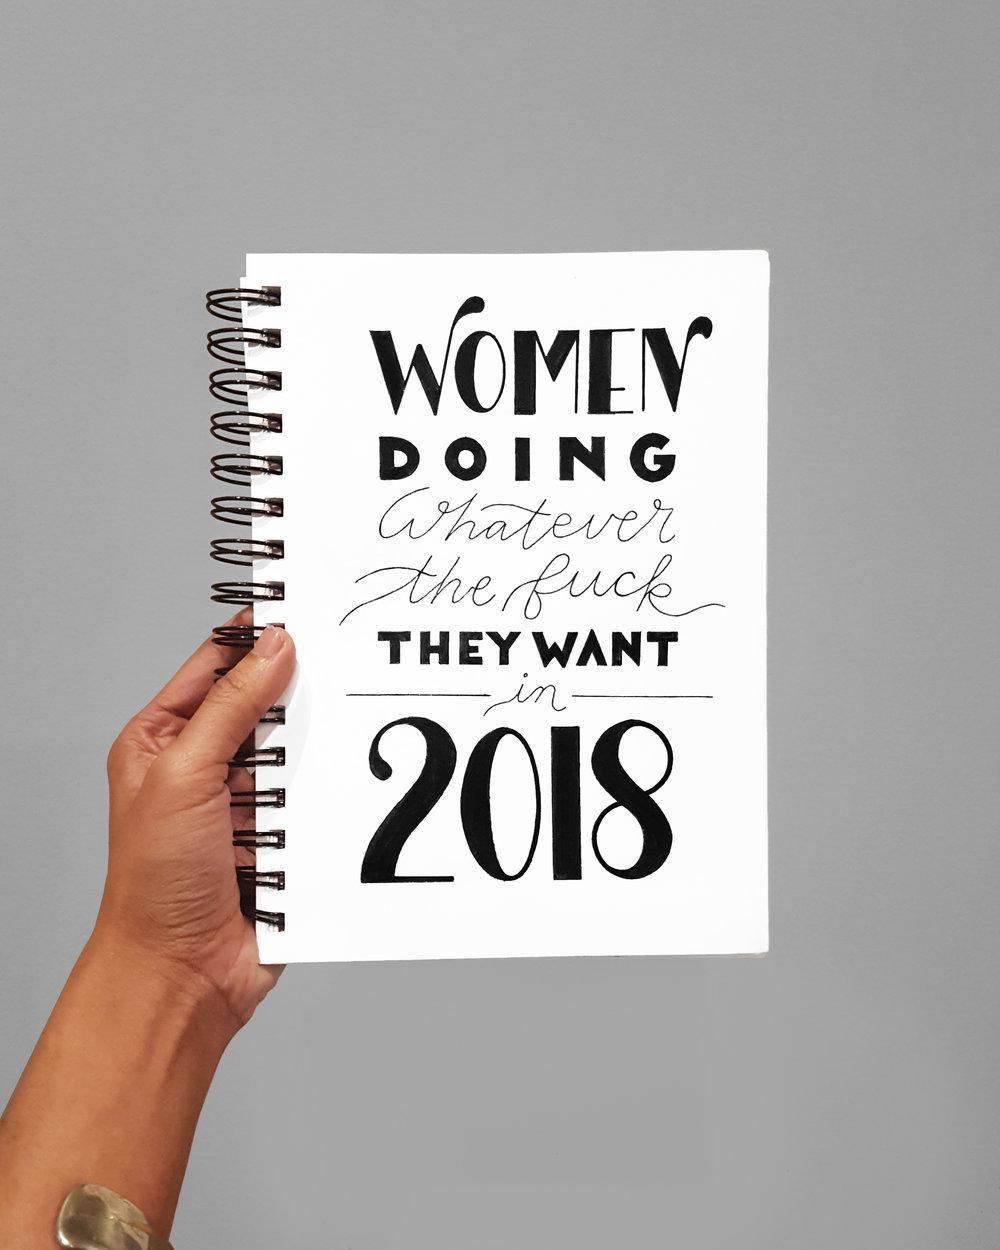 WomenDoingWhateverTheyWant.jpg